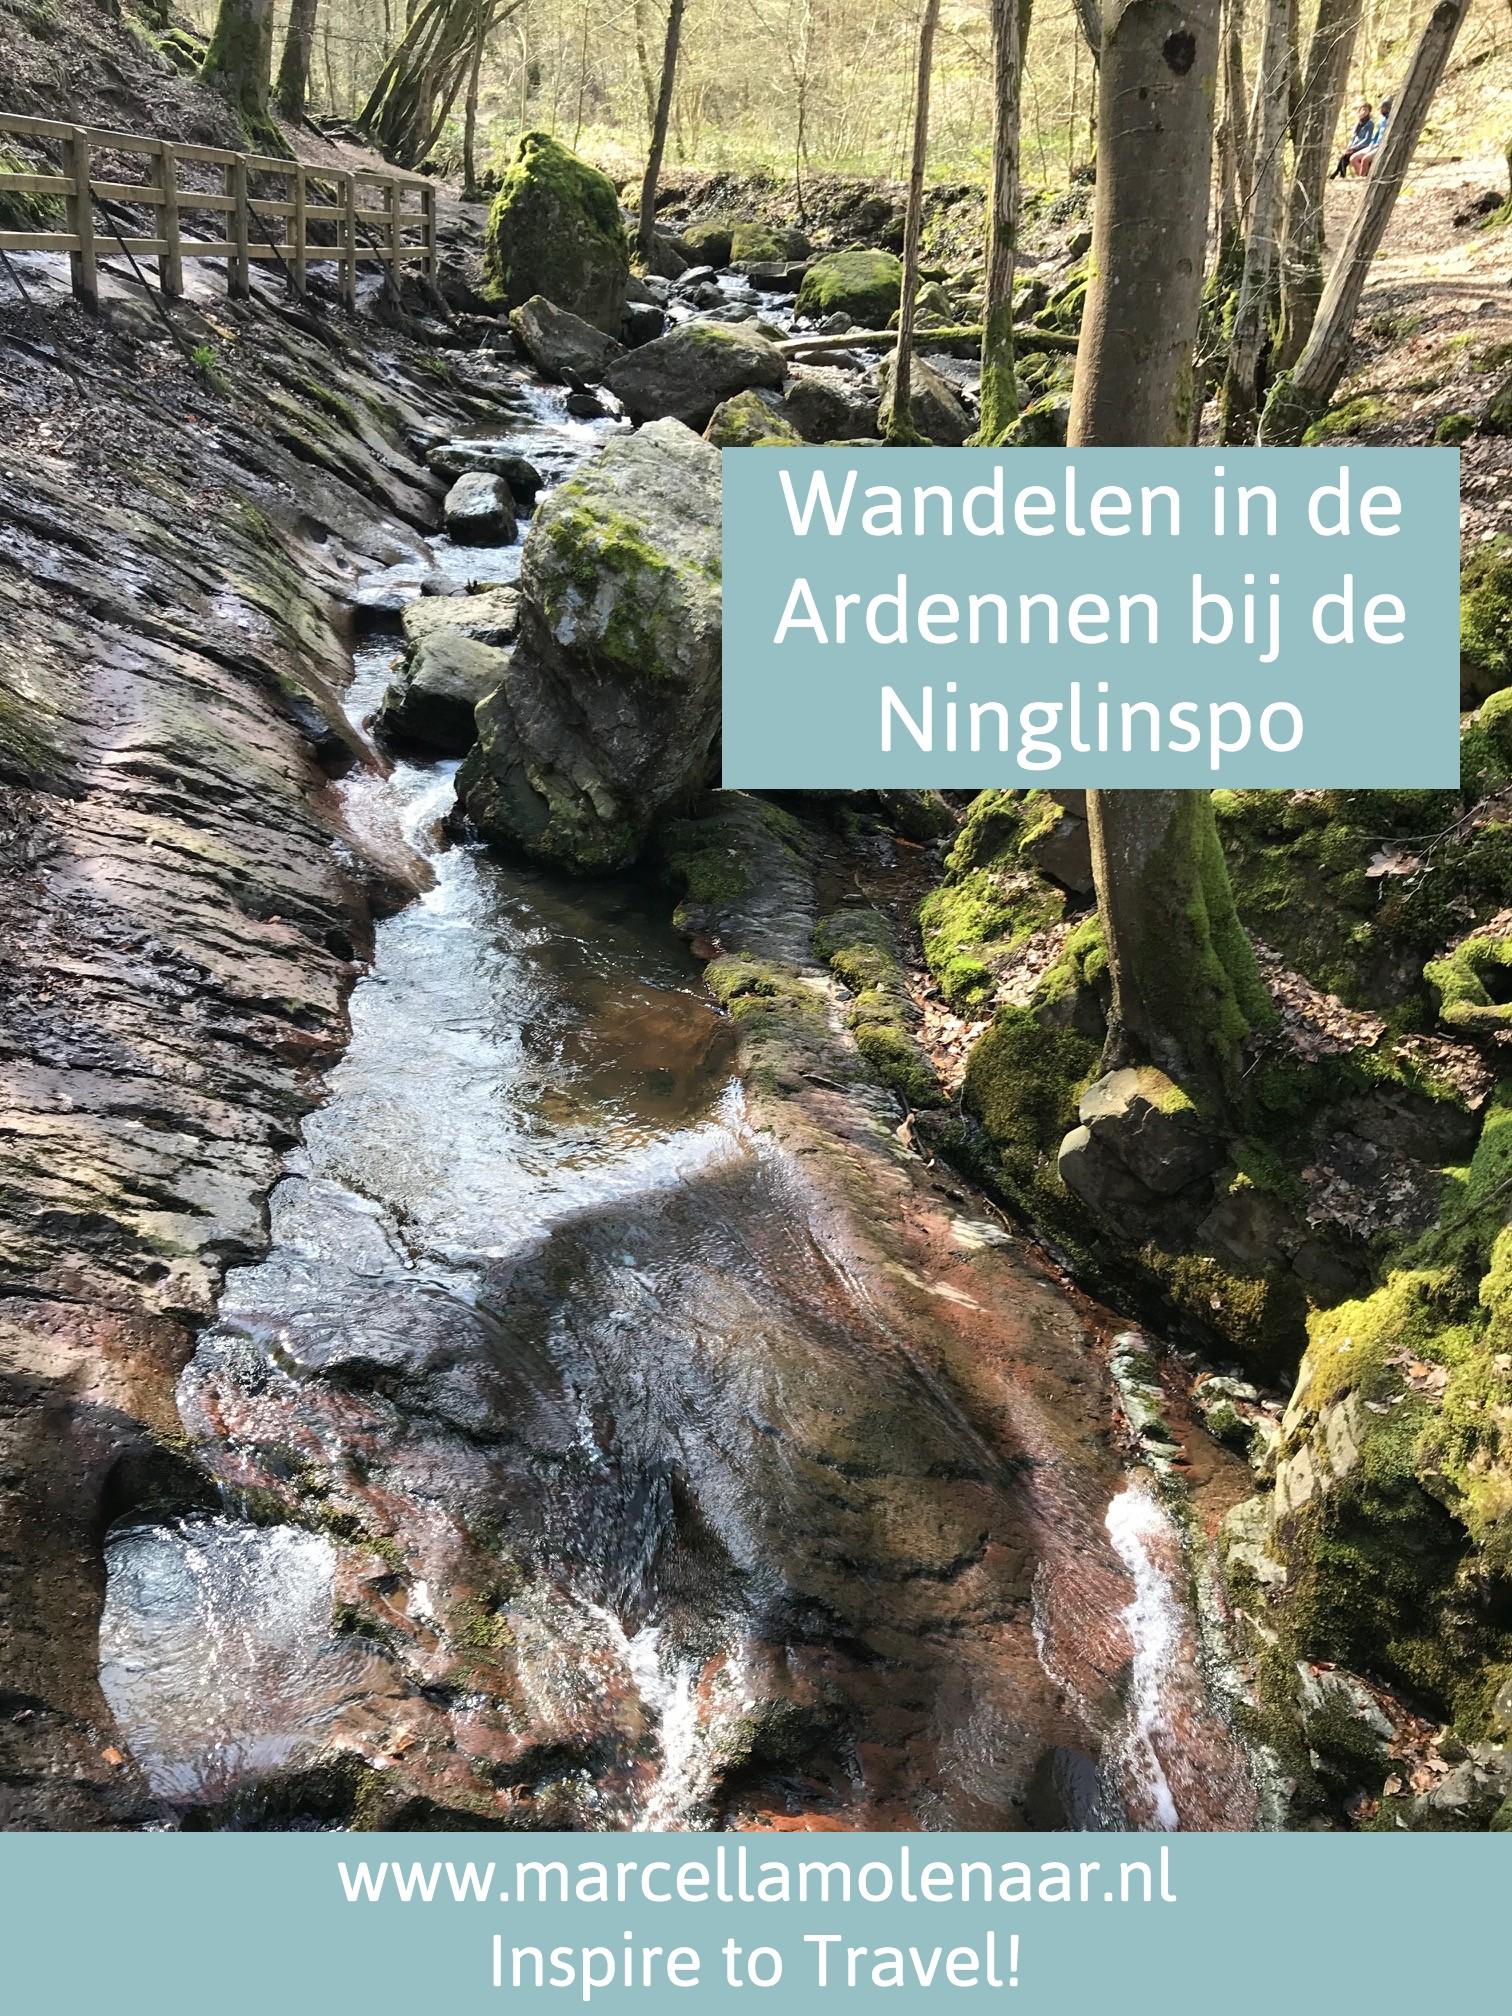 Ninglinspo Ardennes Belgium